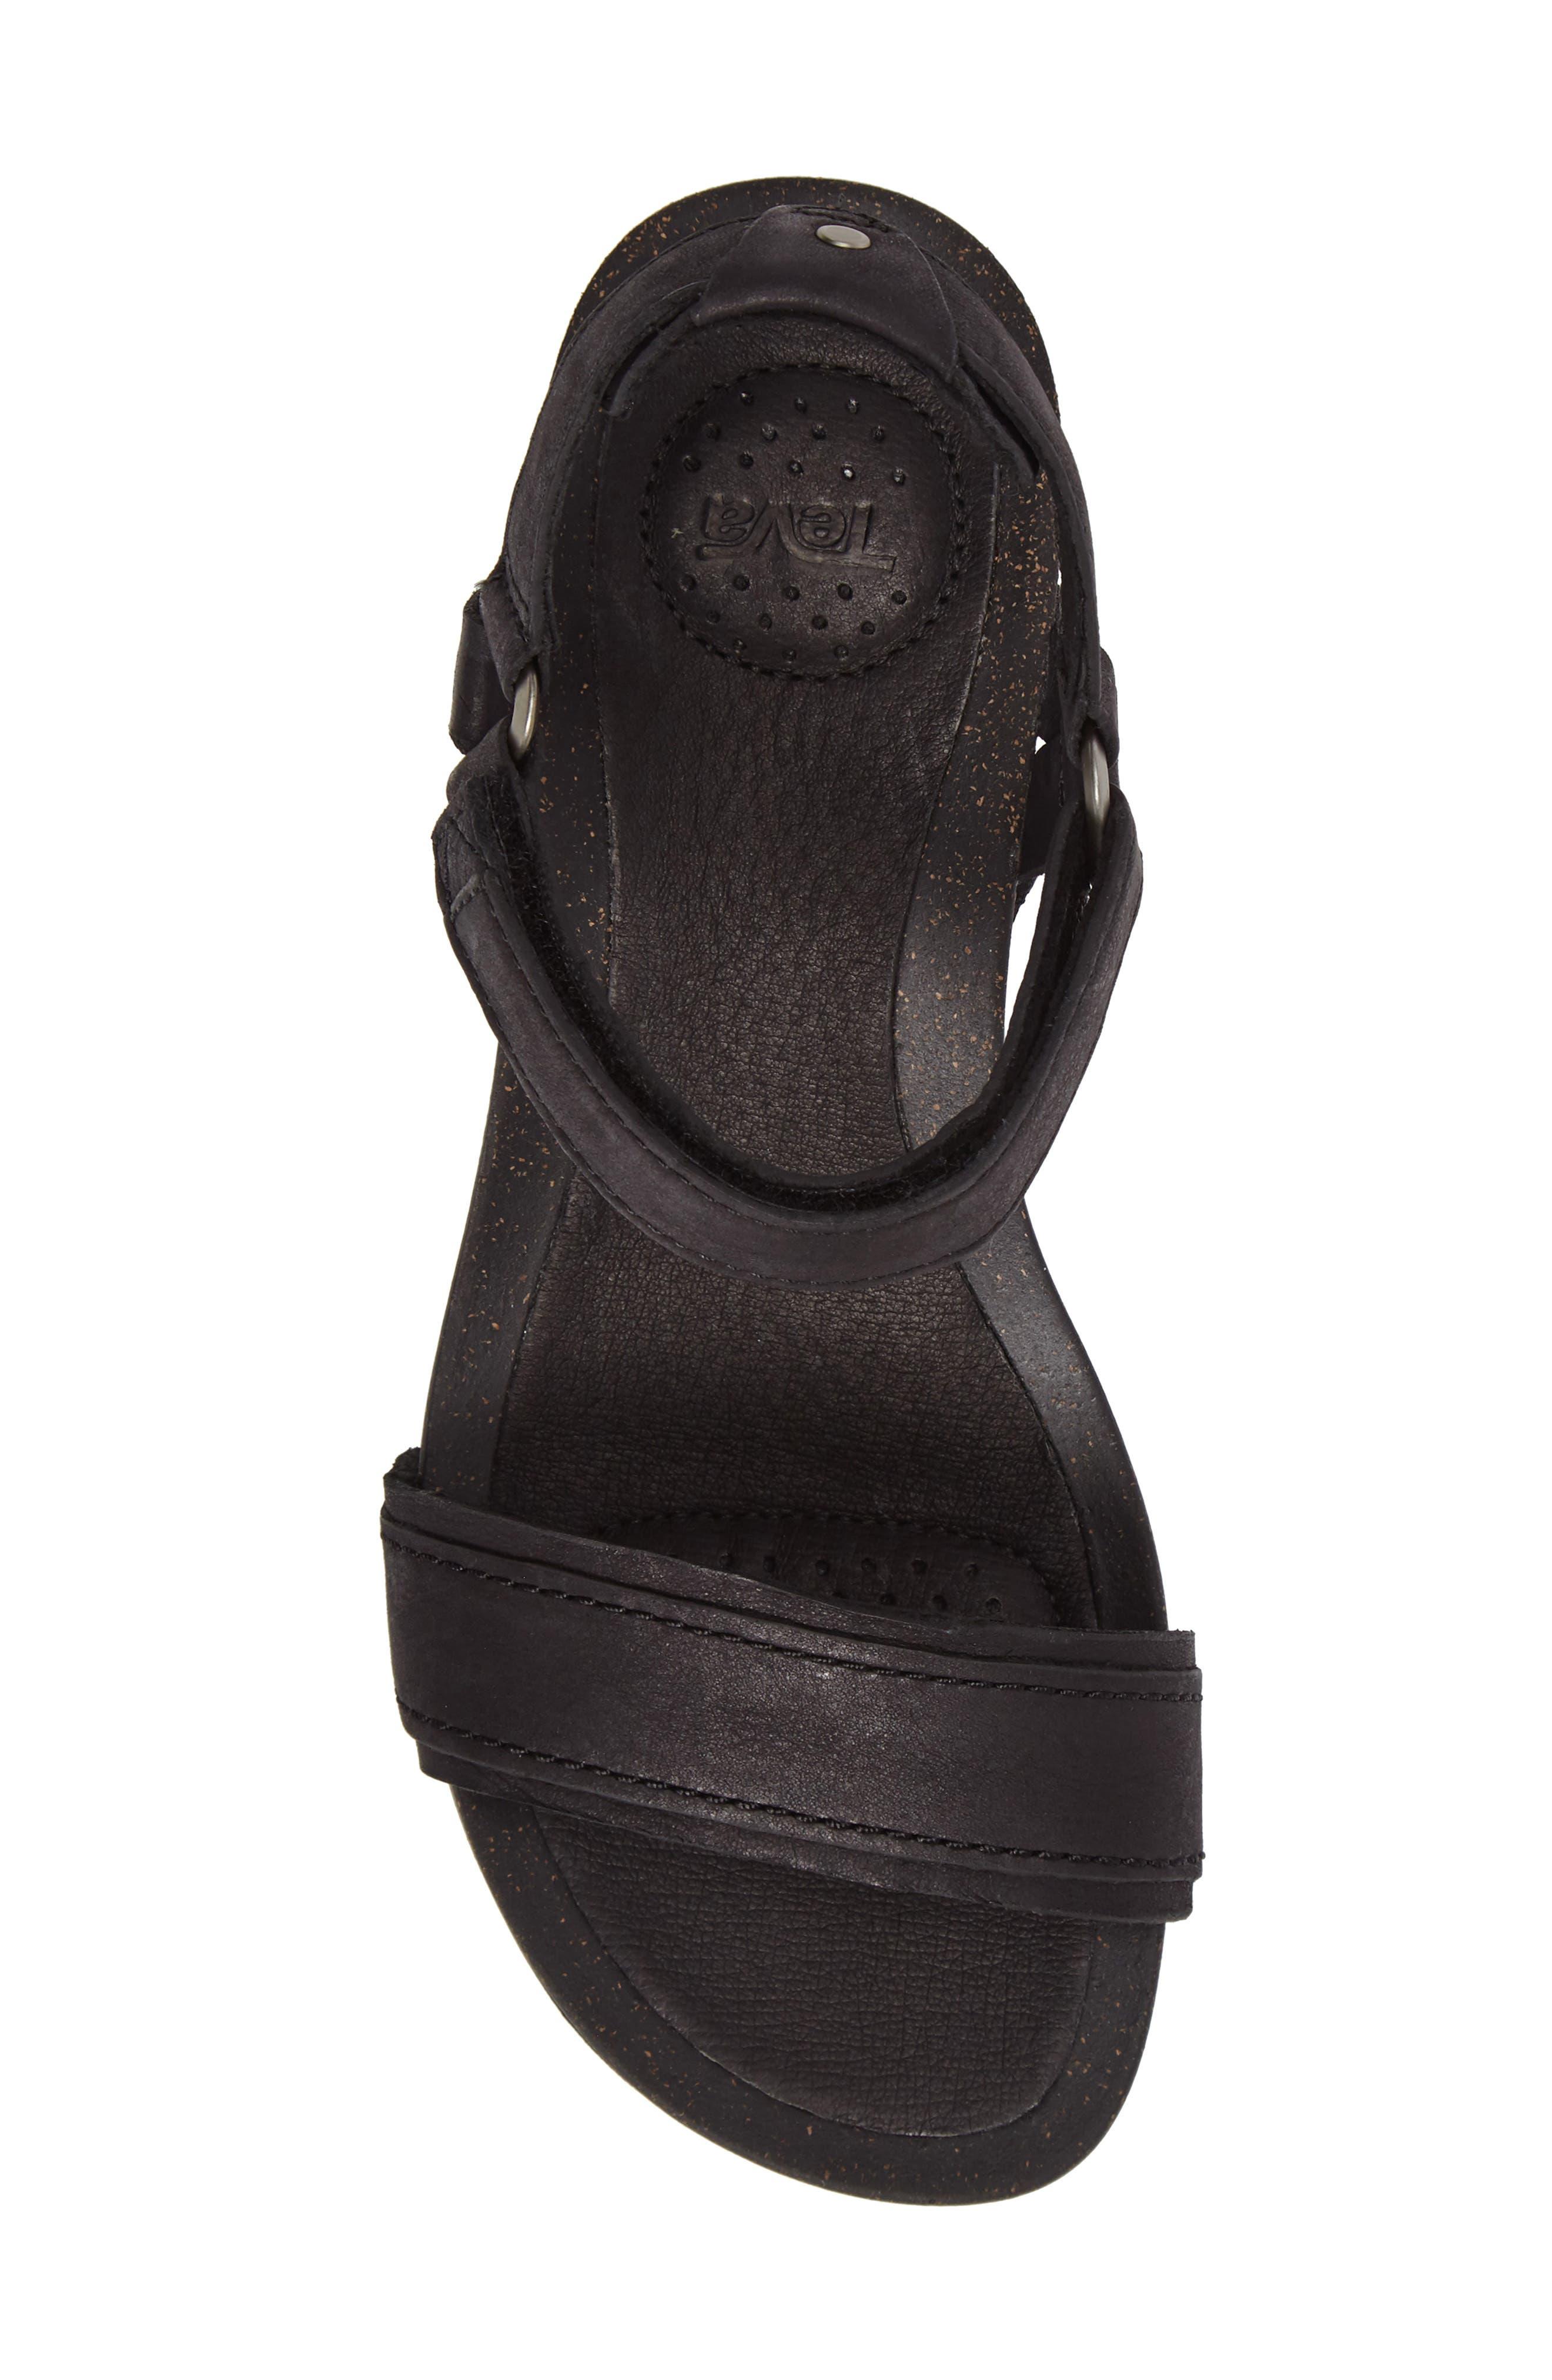 TEVA, Ysidro Stitch Wedge Sandal, Alternate thumbnail 5, color, 001